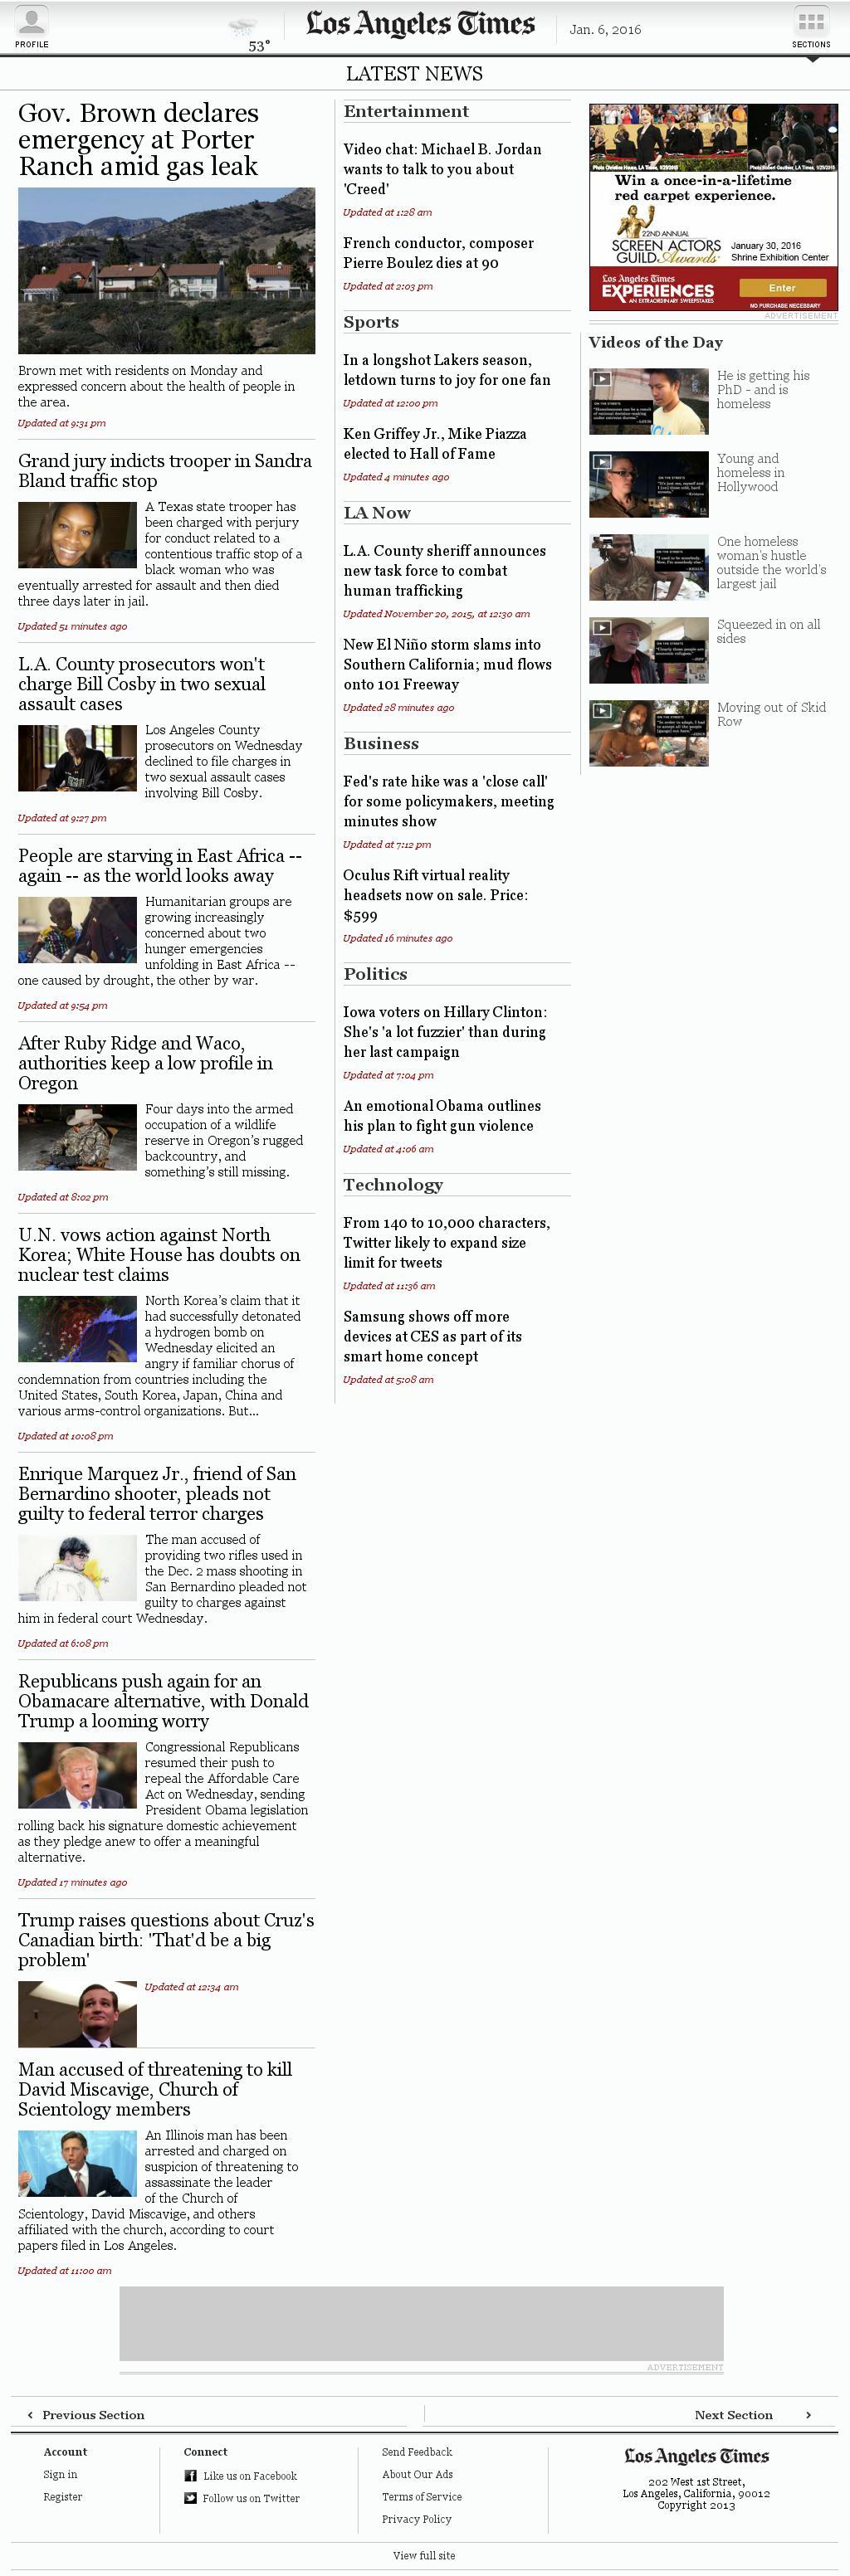 Los Angeles Times at Wednesday Jan. 6, 2016, 11:14 p.m. UTC